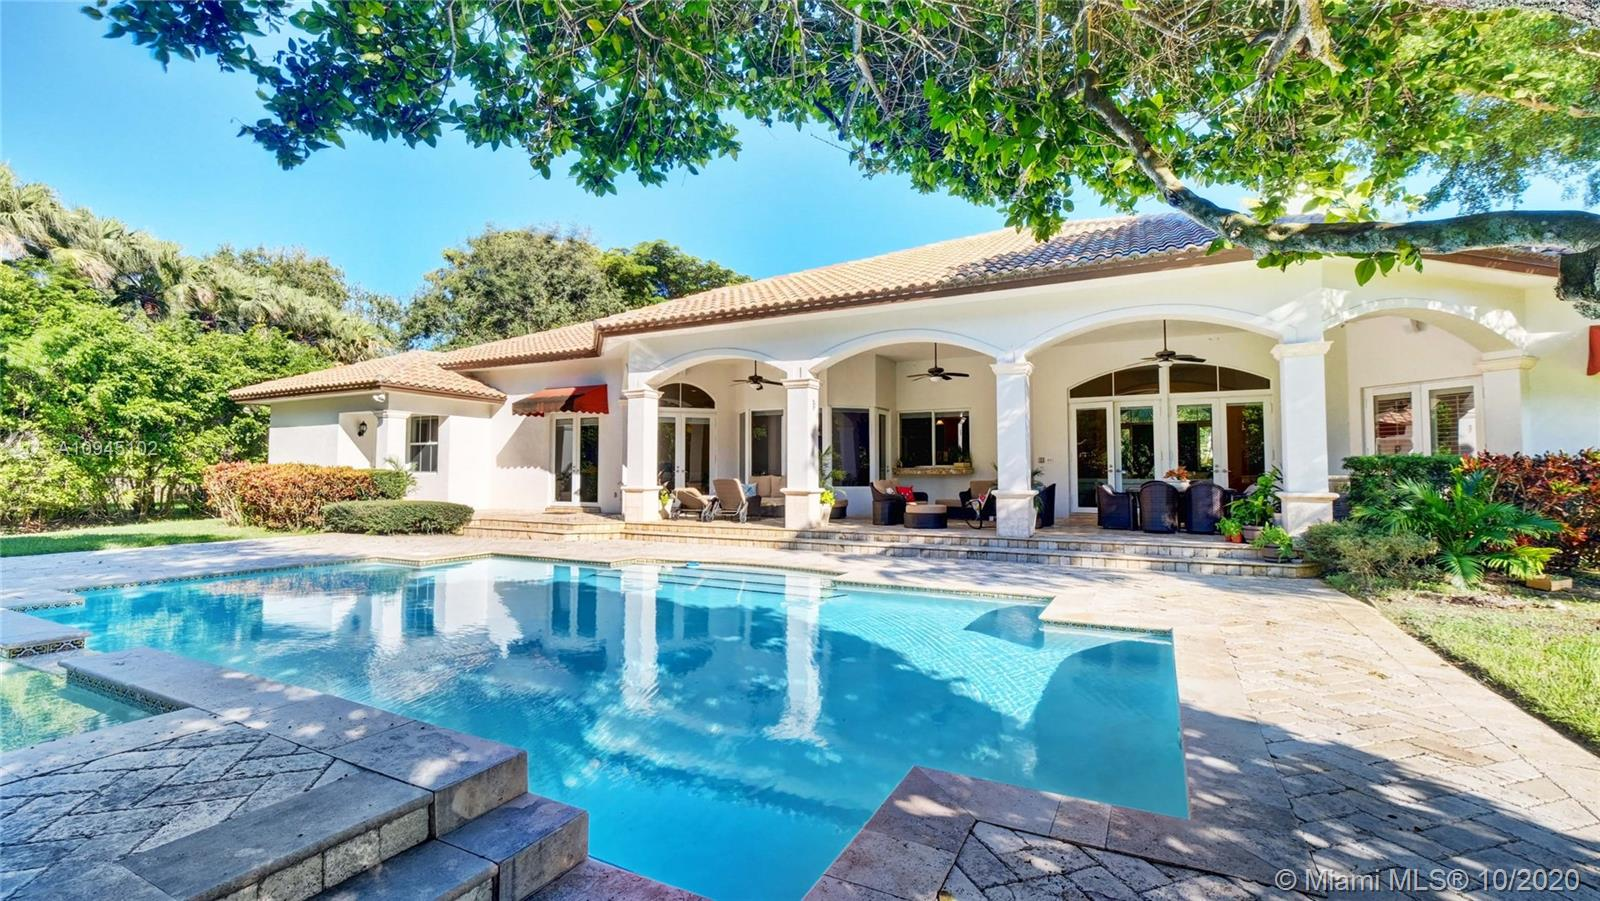 11100 Killian Park Rd, Pinecrest, Florida 33156, 5 Bedrooms Bedrooms, ,6 BathroomsBathrooms,Residential,For Sale,11100 Killian Park Rd,A10945102